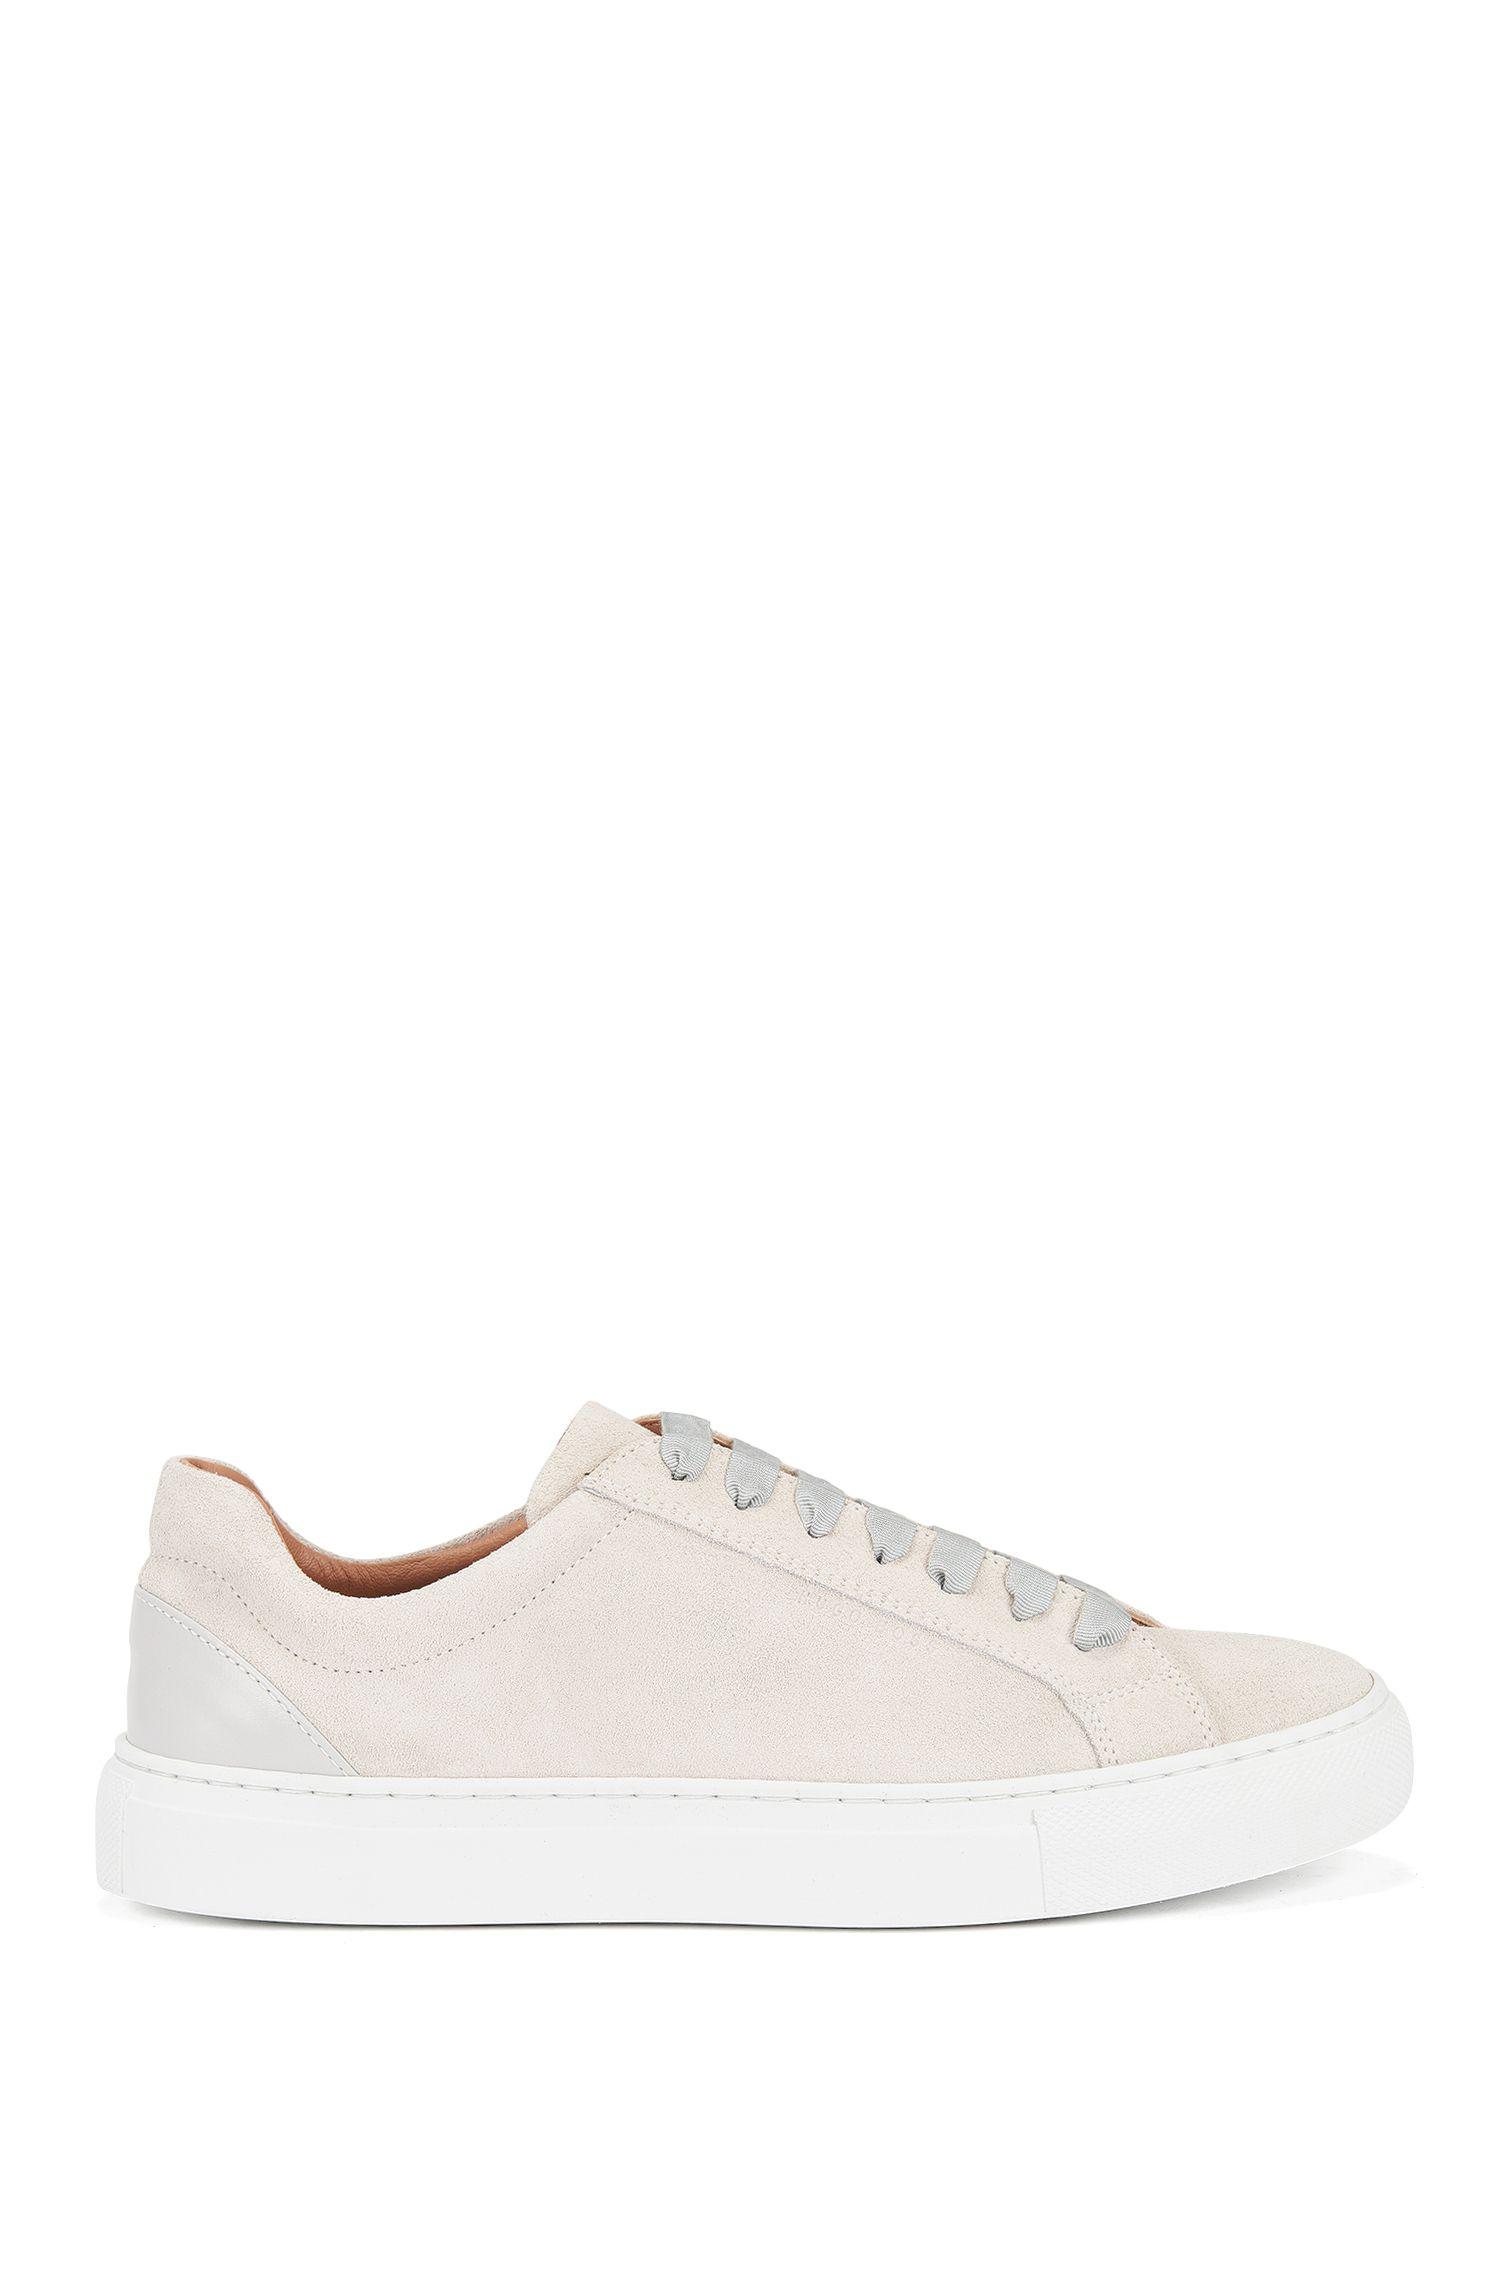 'Low Cut S' | Suede Sneakers